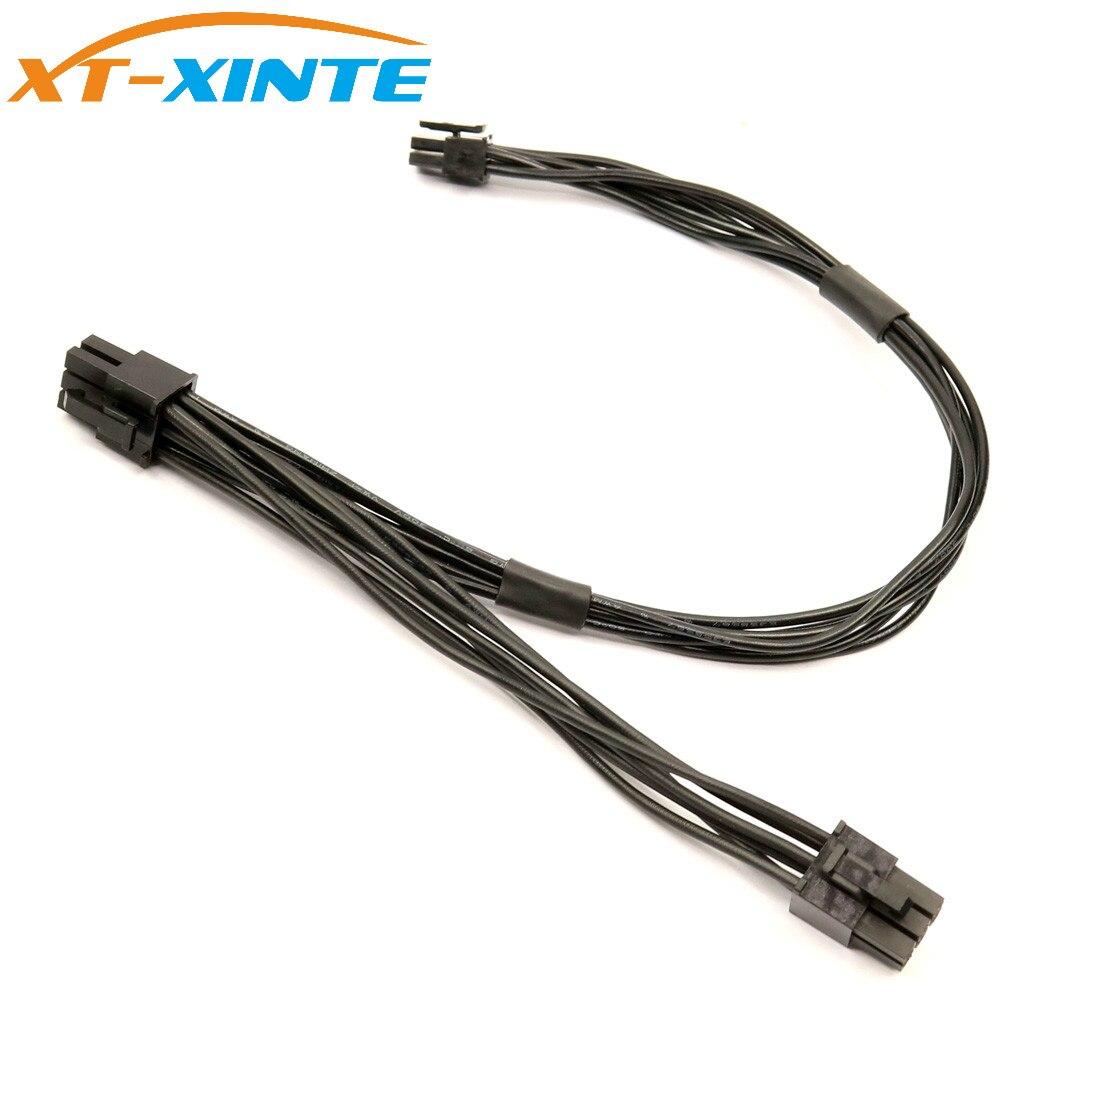 XT-XINTE placa base 6 pines tipo pequeño a 2 puertos PCI-E PCIe 6 pines Cable de alimentación Tarjeta de visualización de vídeo gráficos para Mac Pro /G5